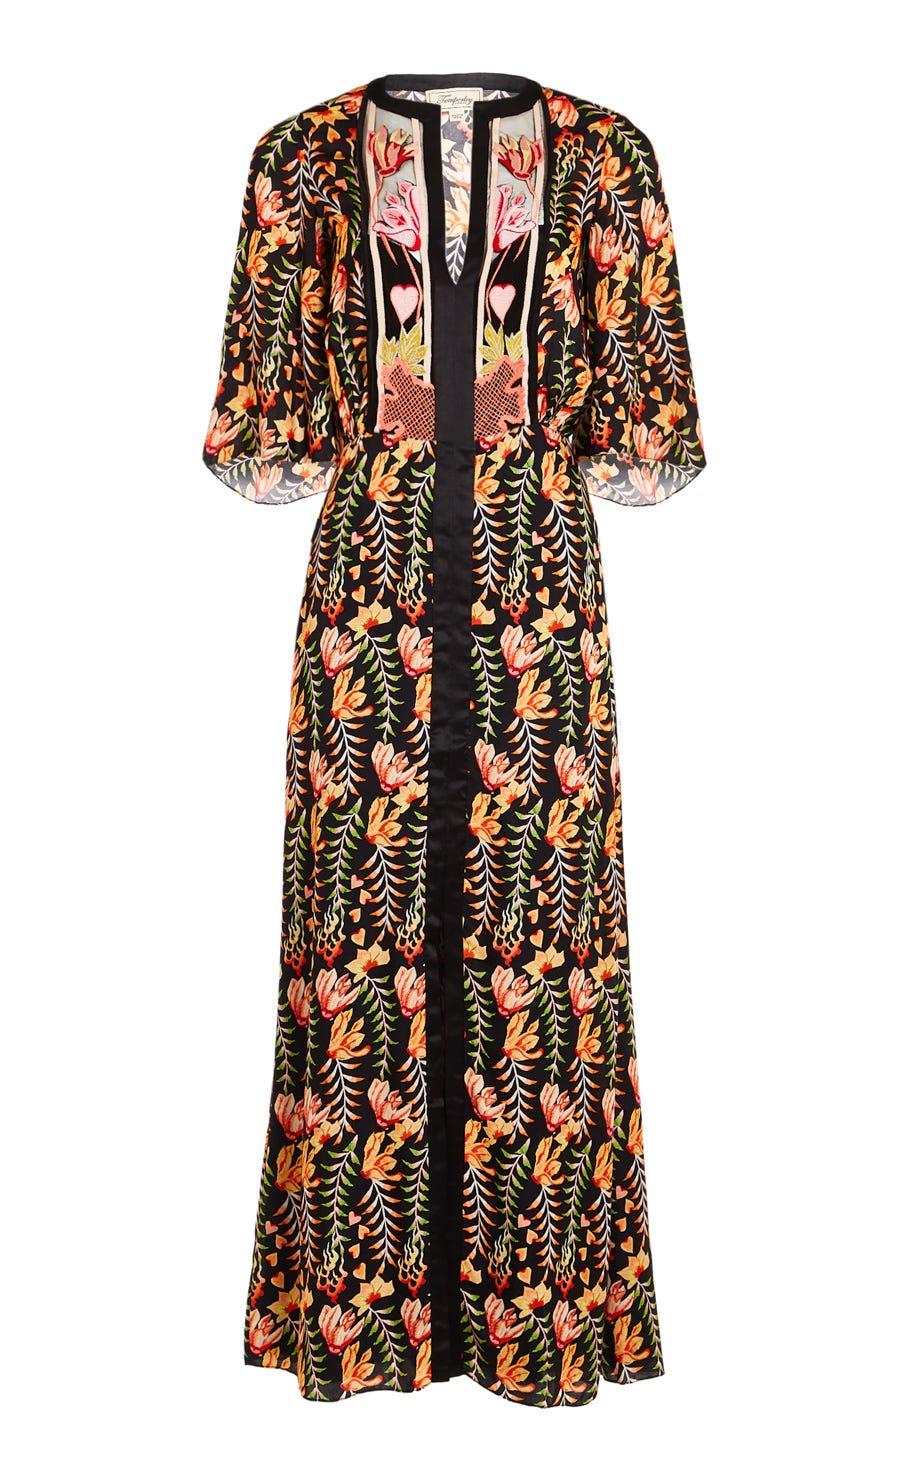 Rosy Sleeved Dress